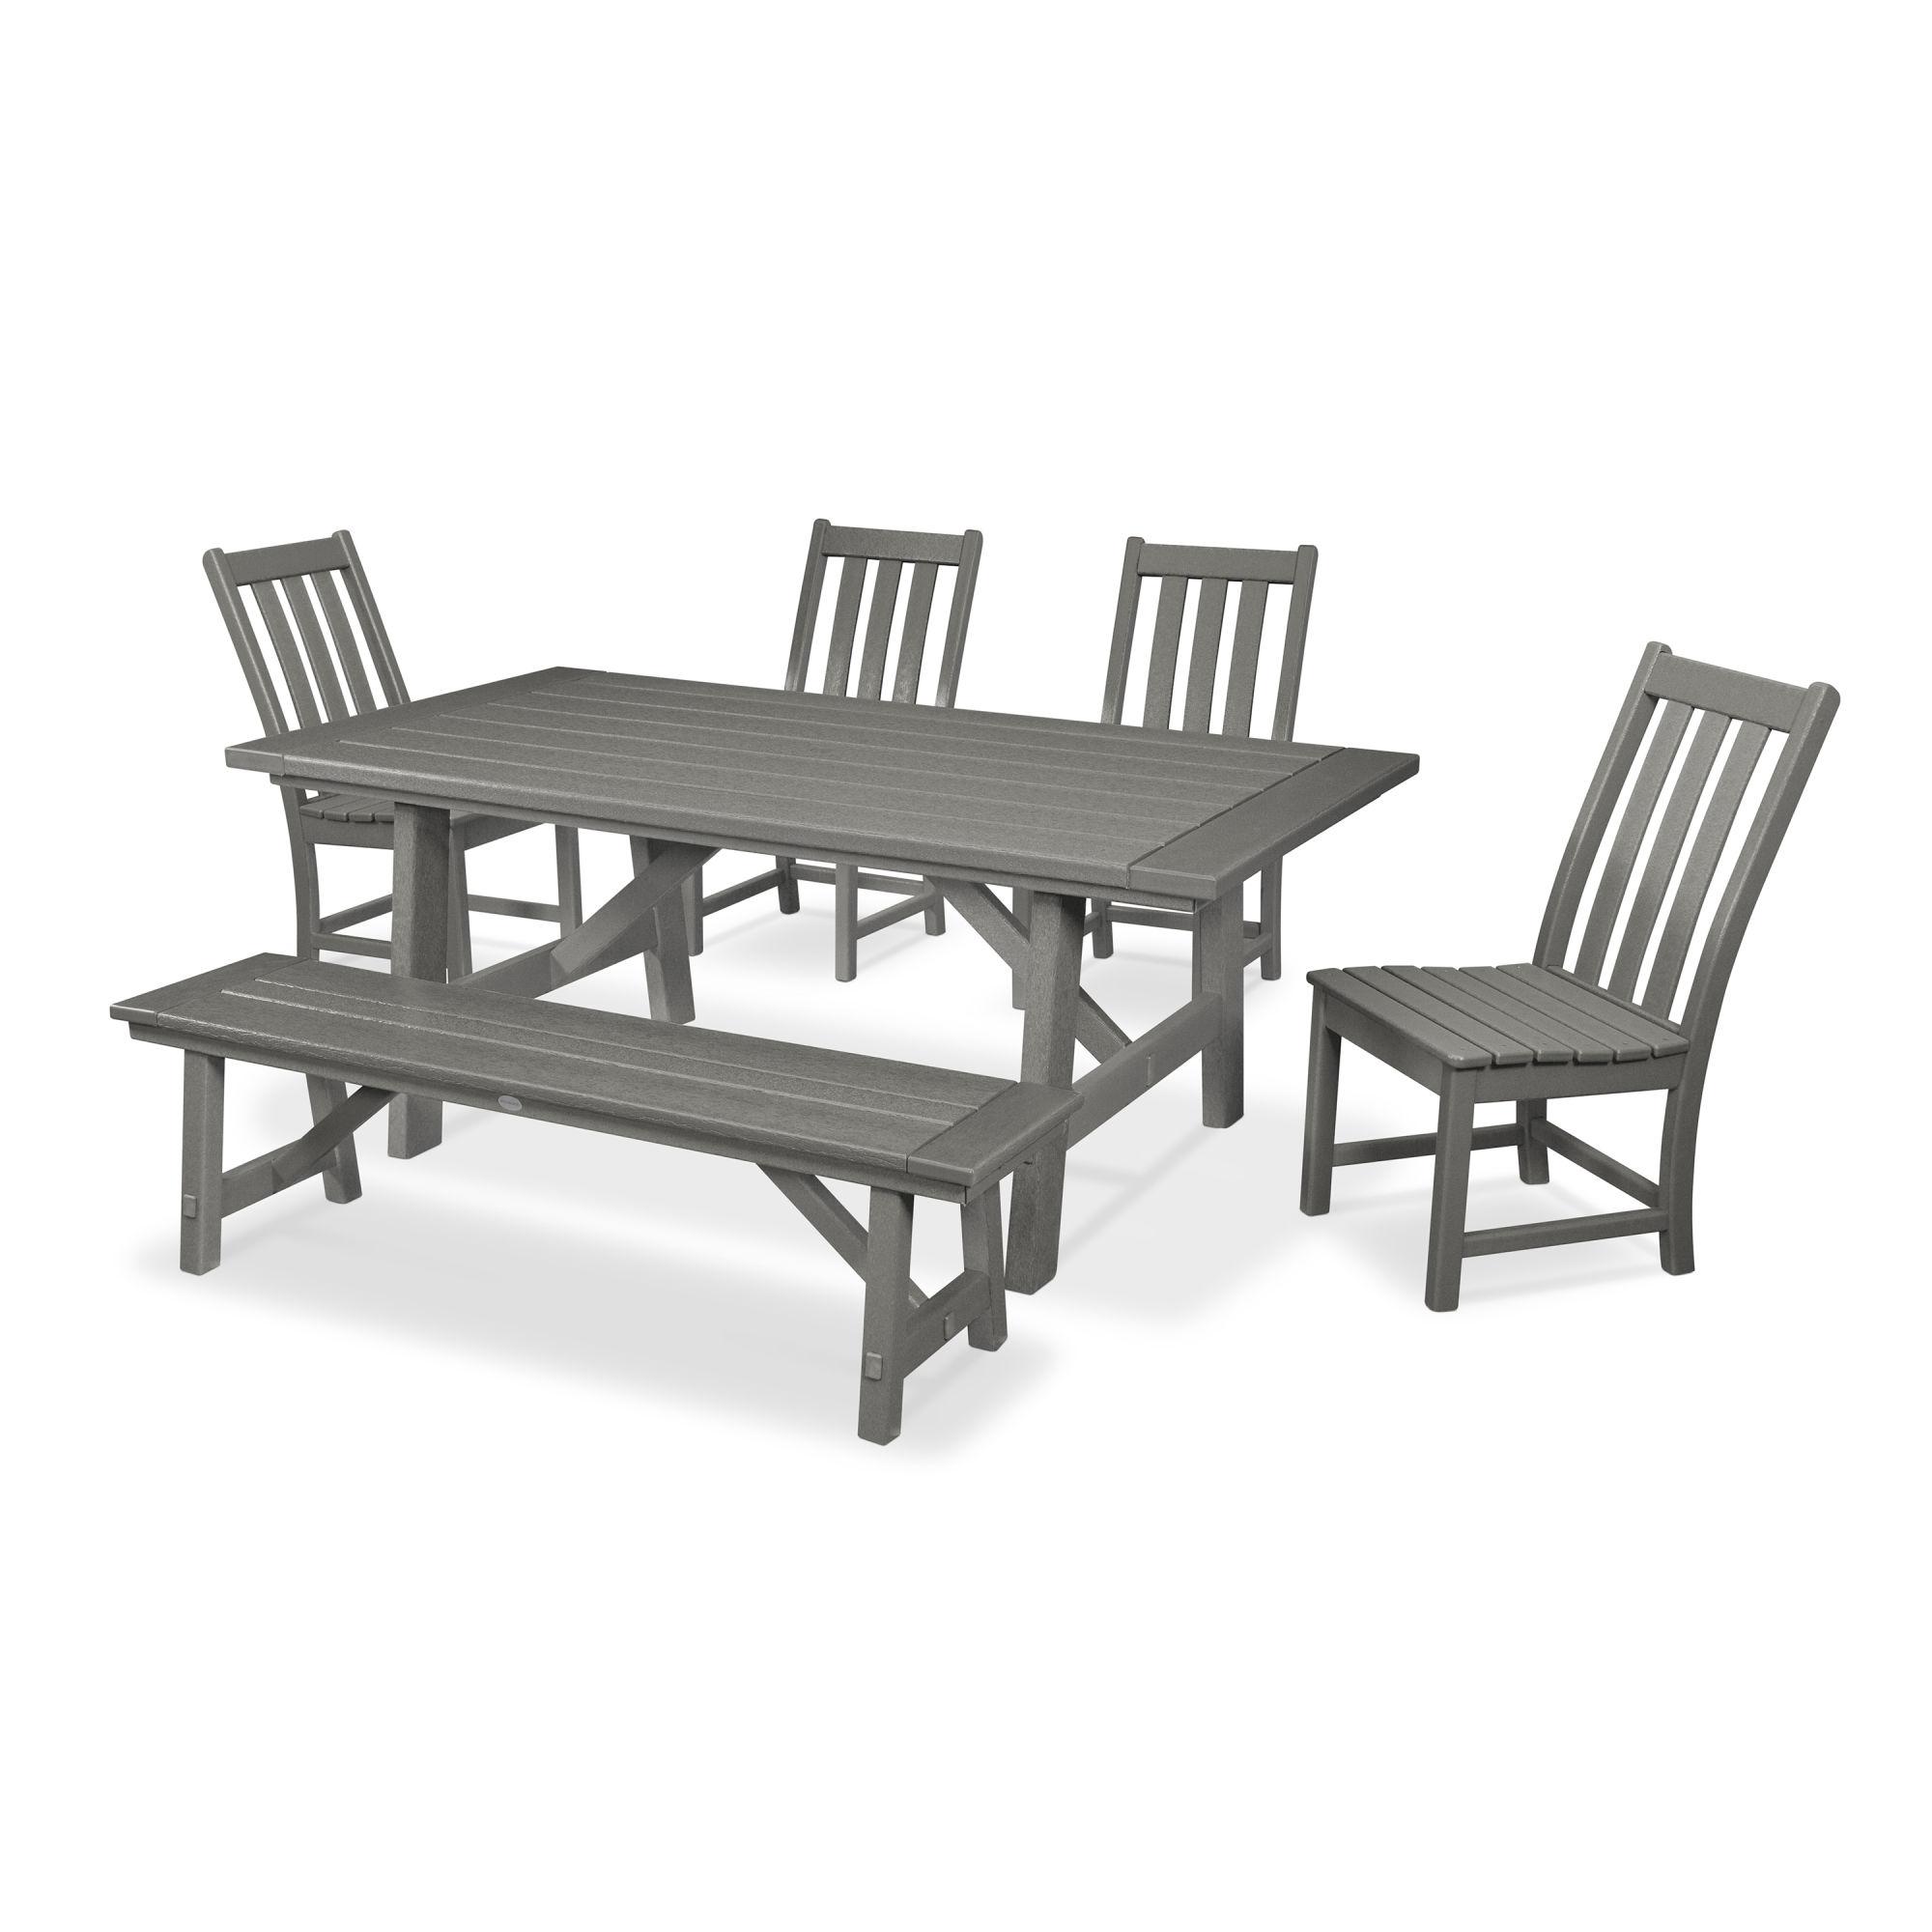 Polywood Vineyard 6 Piece Rustic Farmhouse Side Chair Dining Set